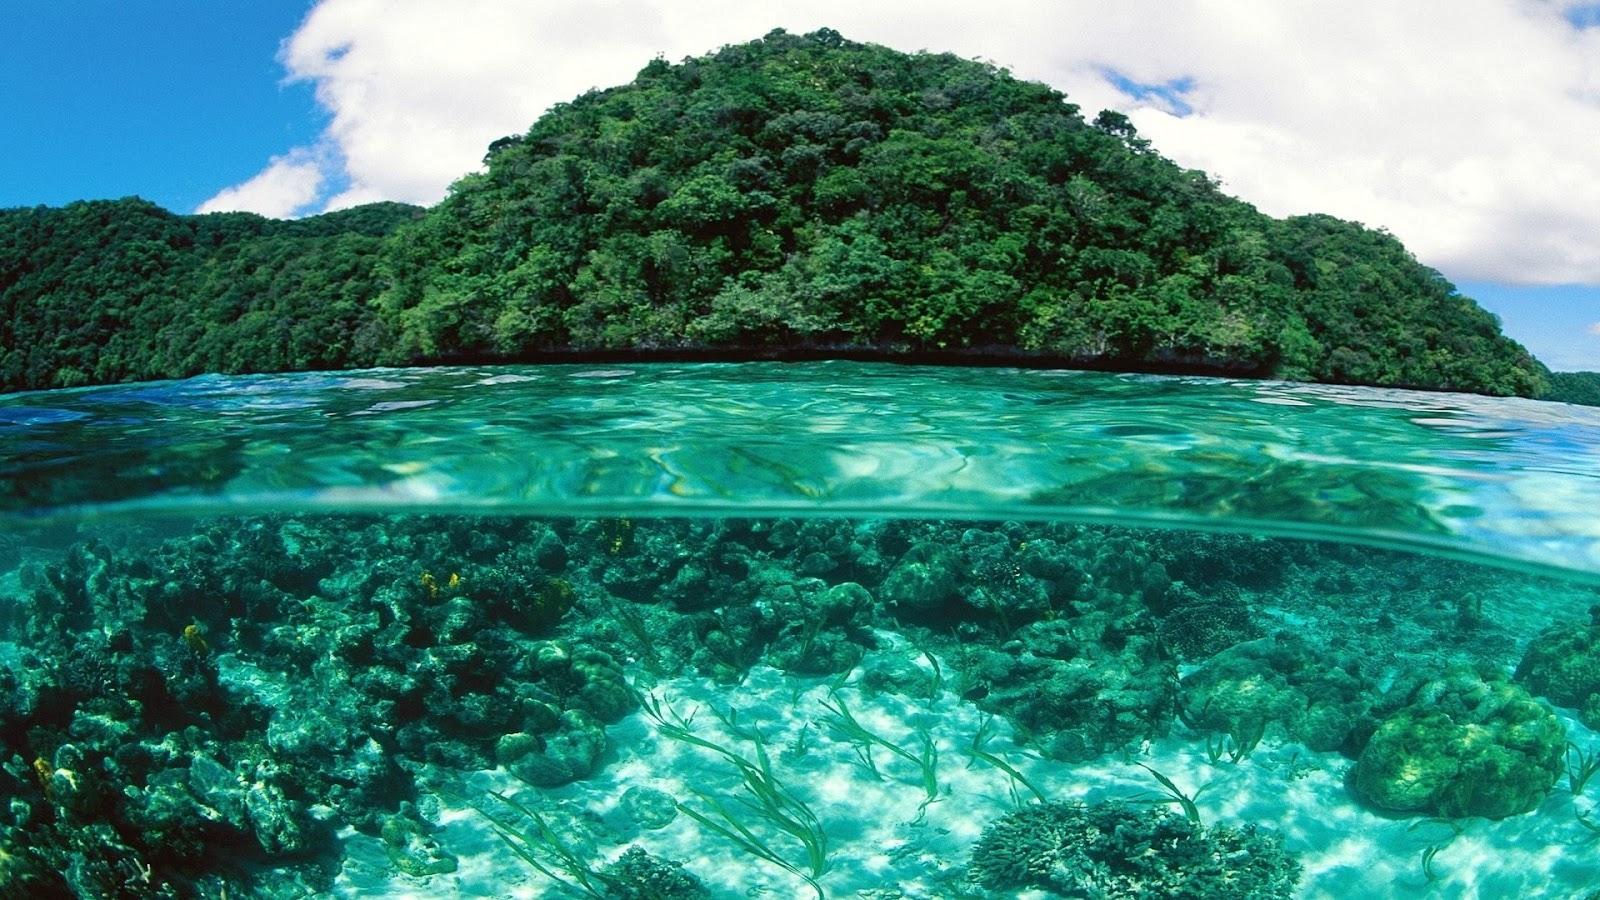 Underwater iphone wallpaper tumblr - Http 4 Bp Blogspot Com Qeaoqj1 Guy